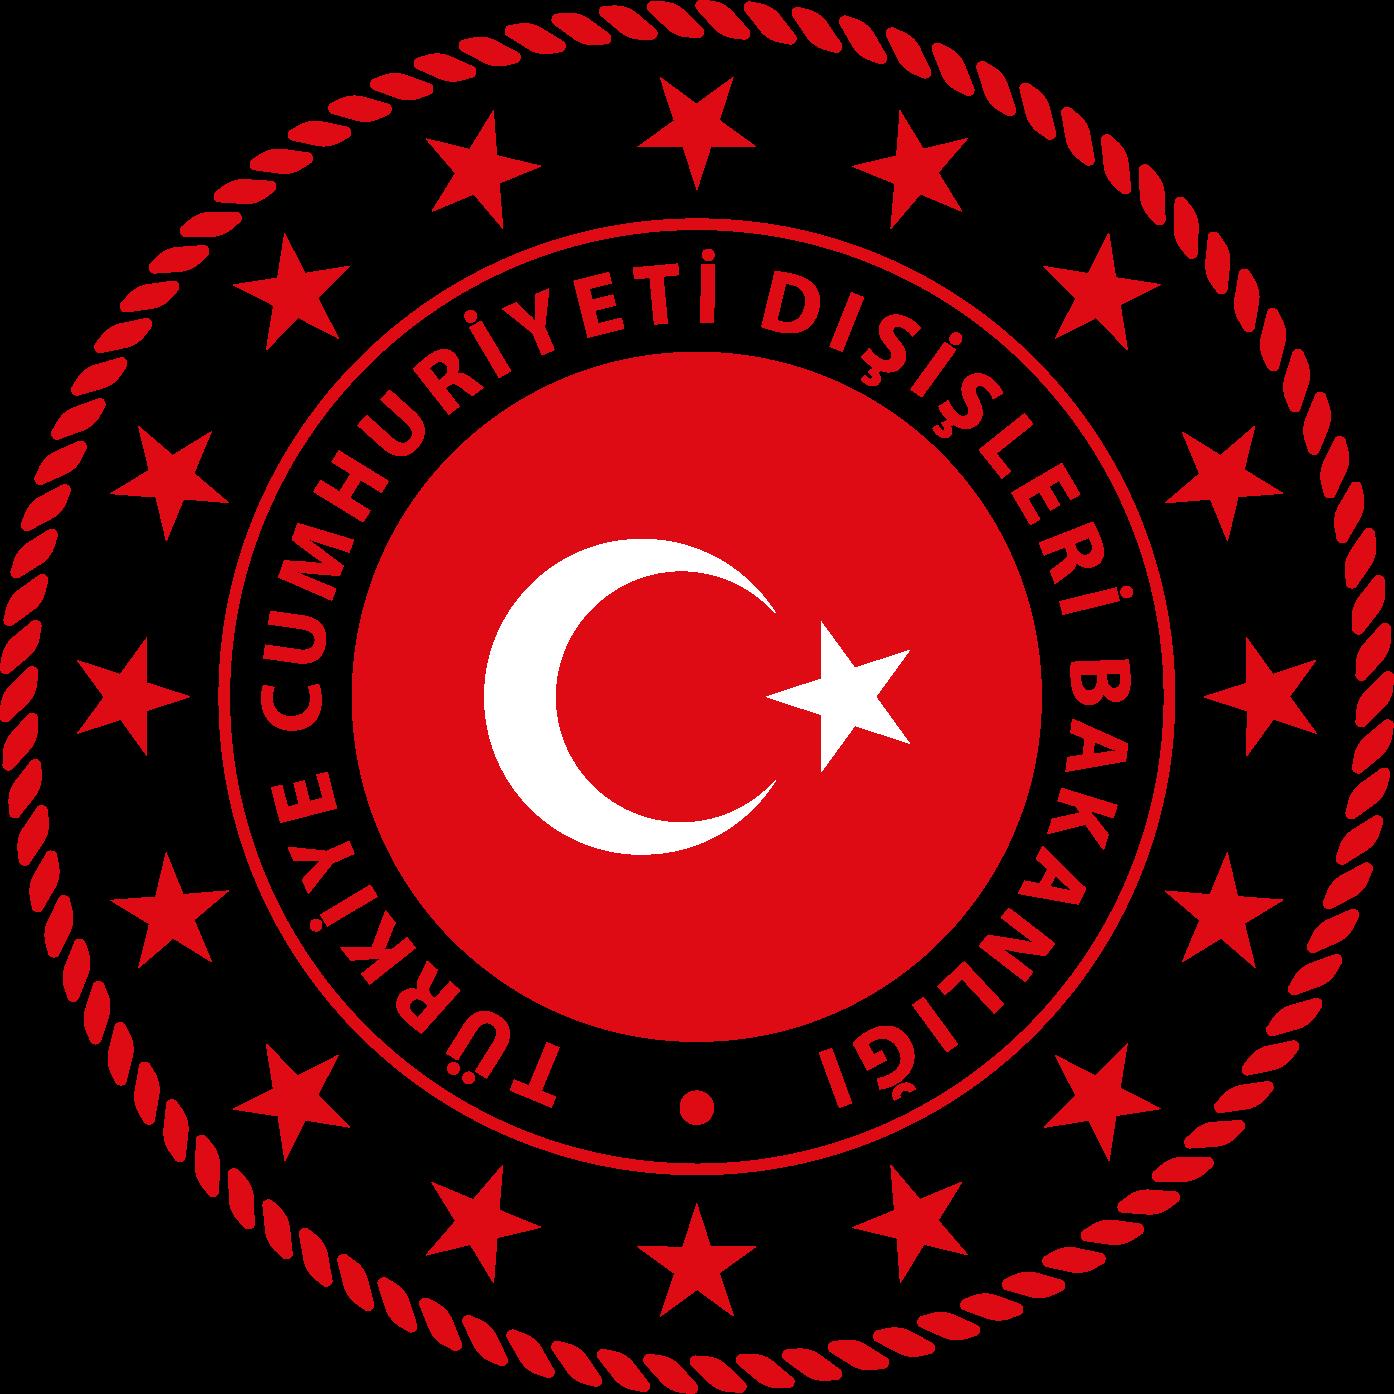 t c disisleri bakanligi logo